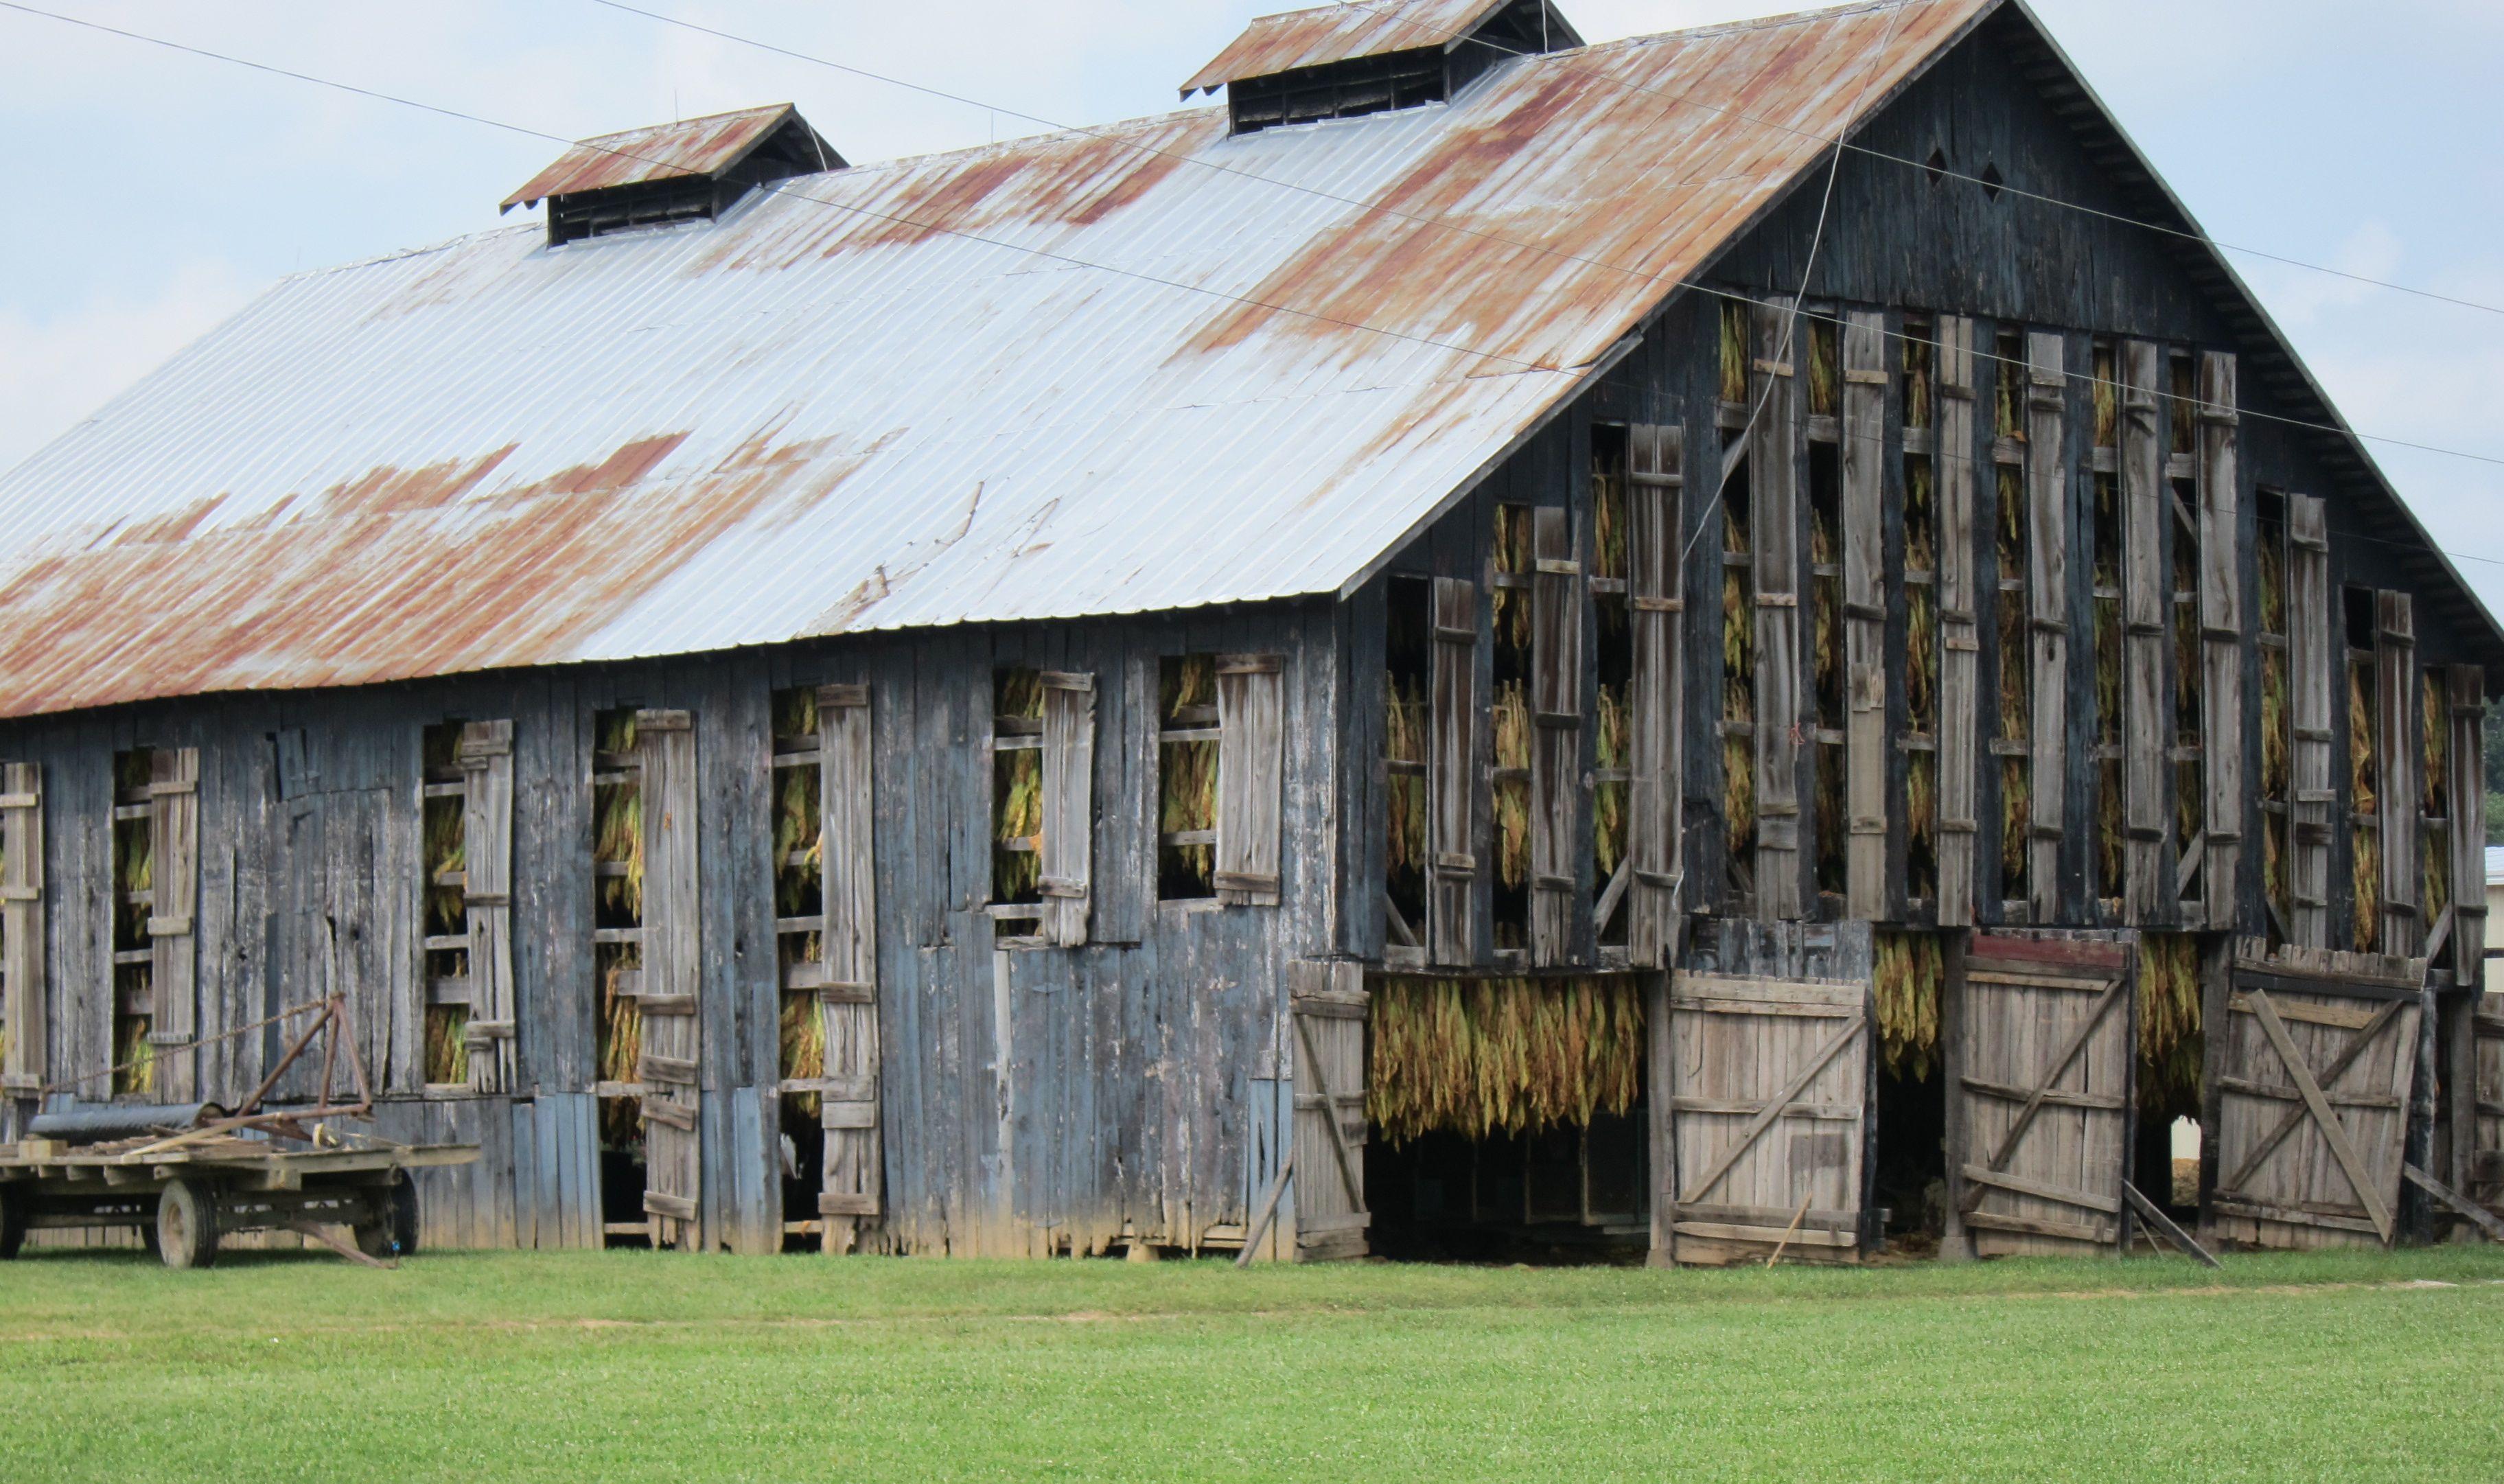 Tobacco Barn Google Search Grapes Of Wrath Inspiration Barn